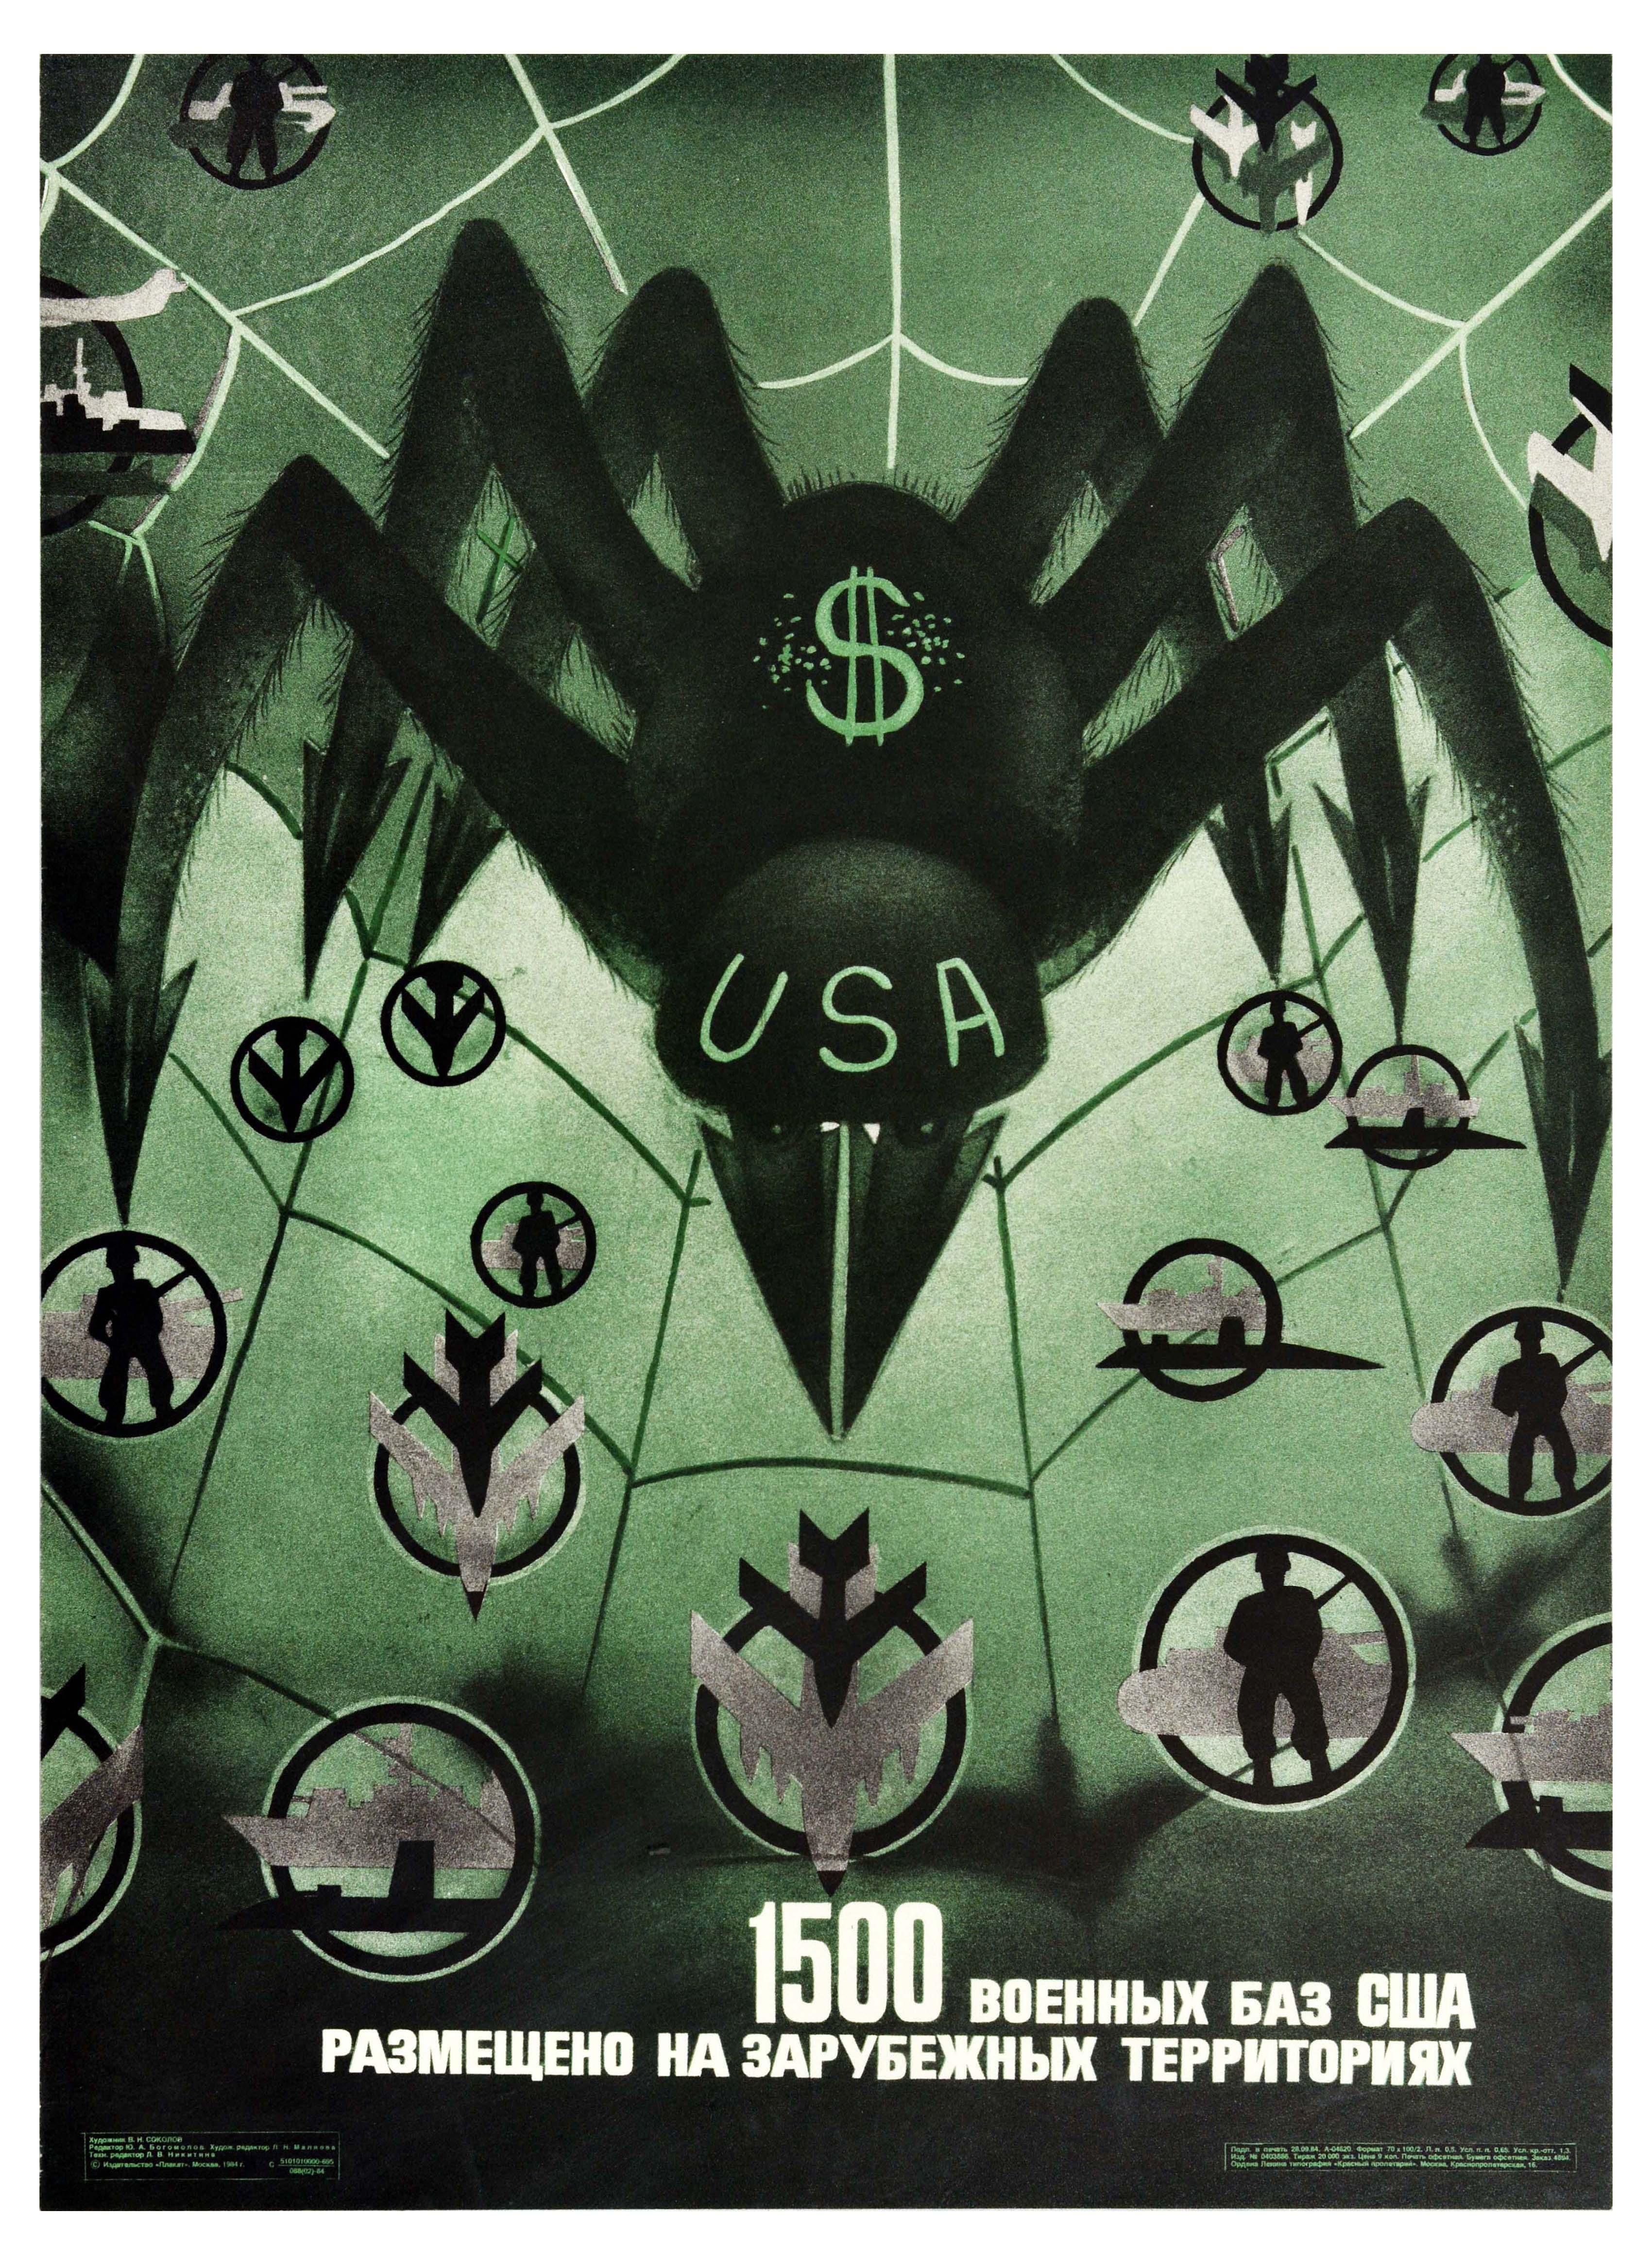 Propaganda Poster USA Military Bases NATO Spider USSR